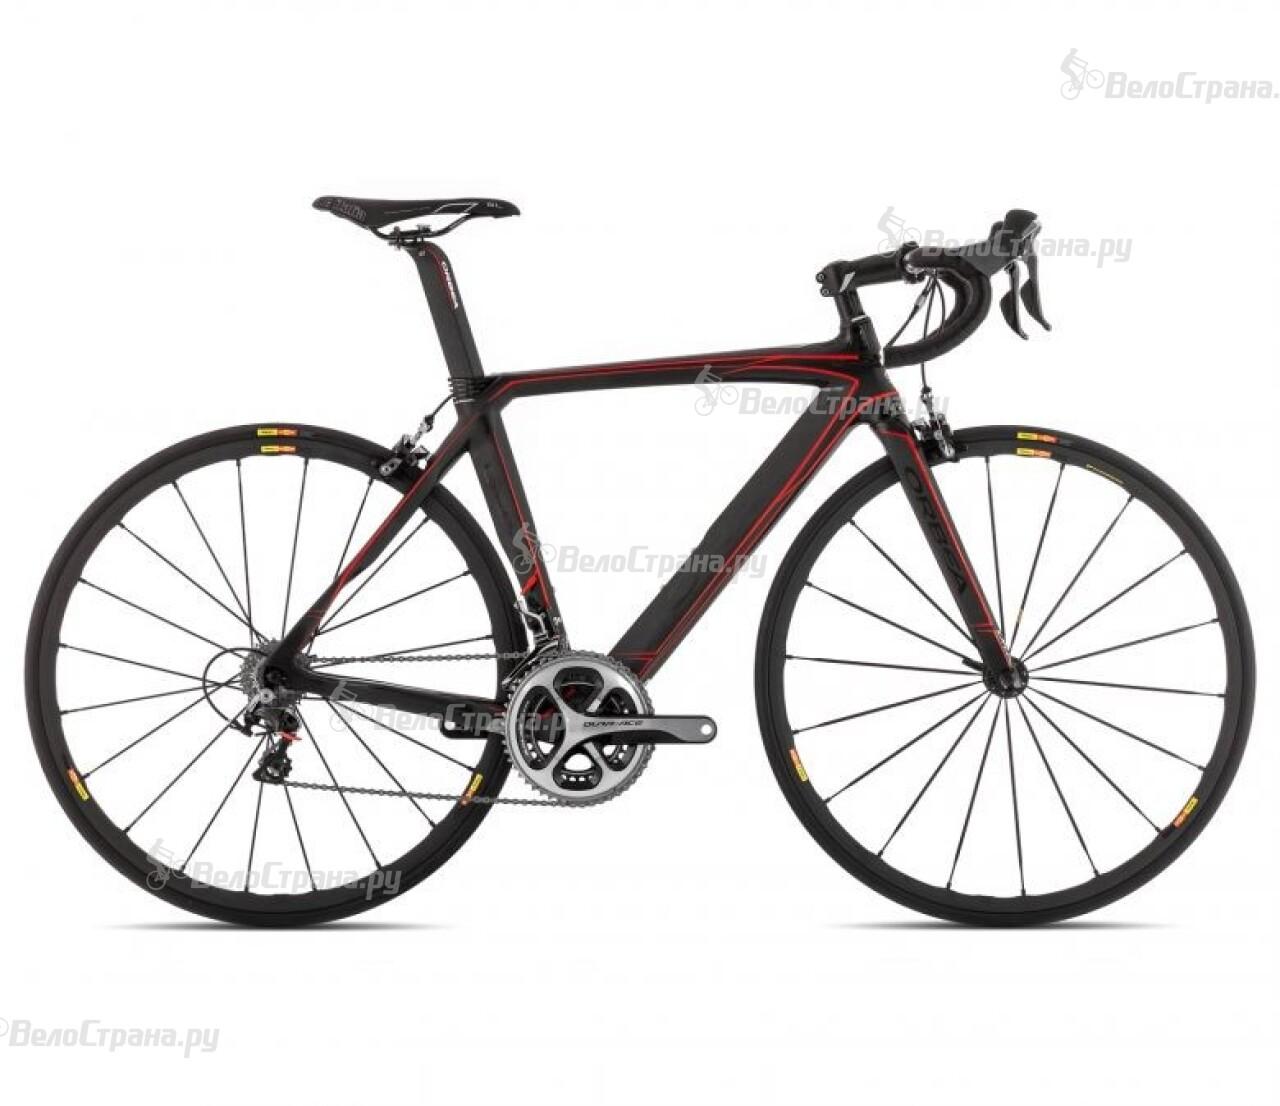 все цены на Велосипед Orbea Orca M-team (2014) онлайн